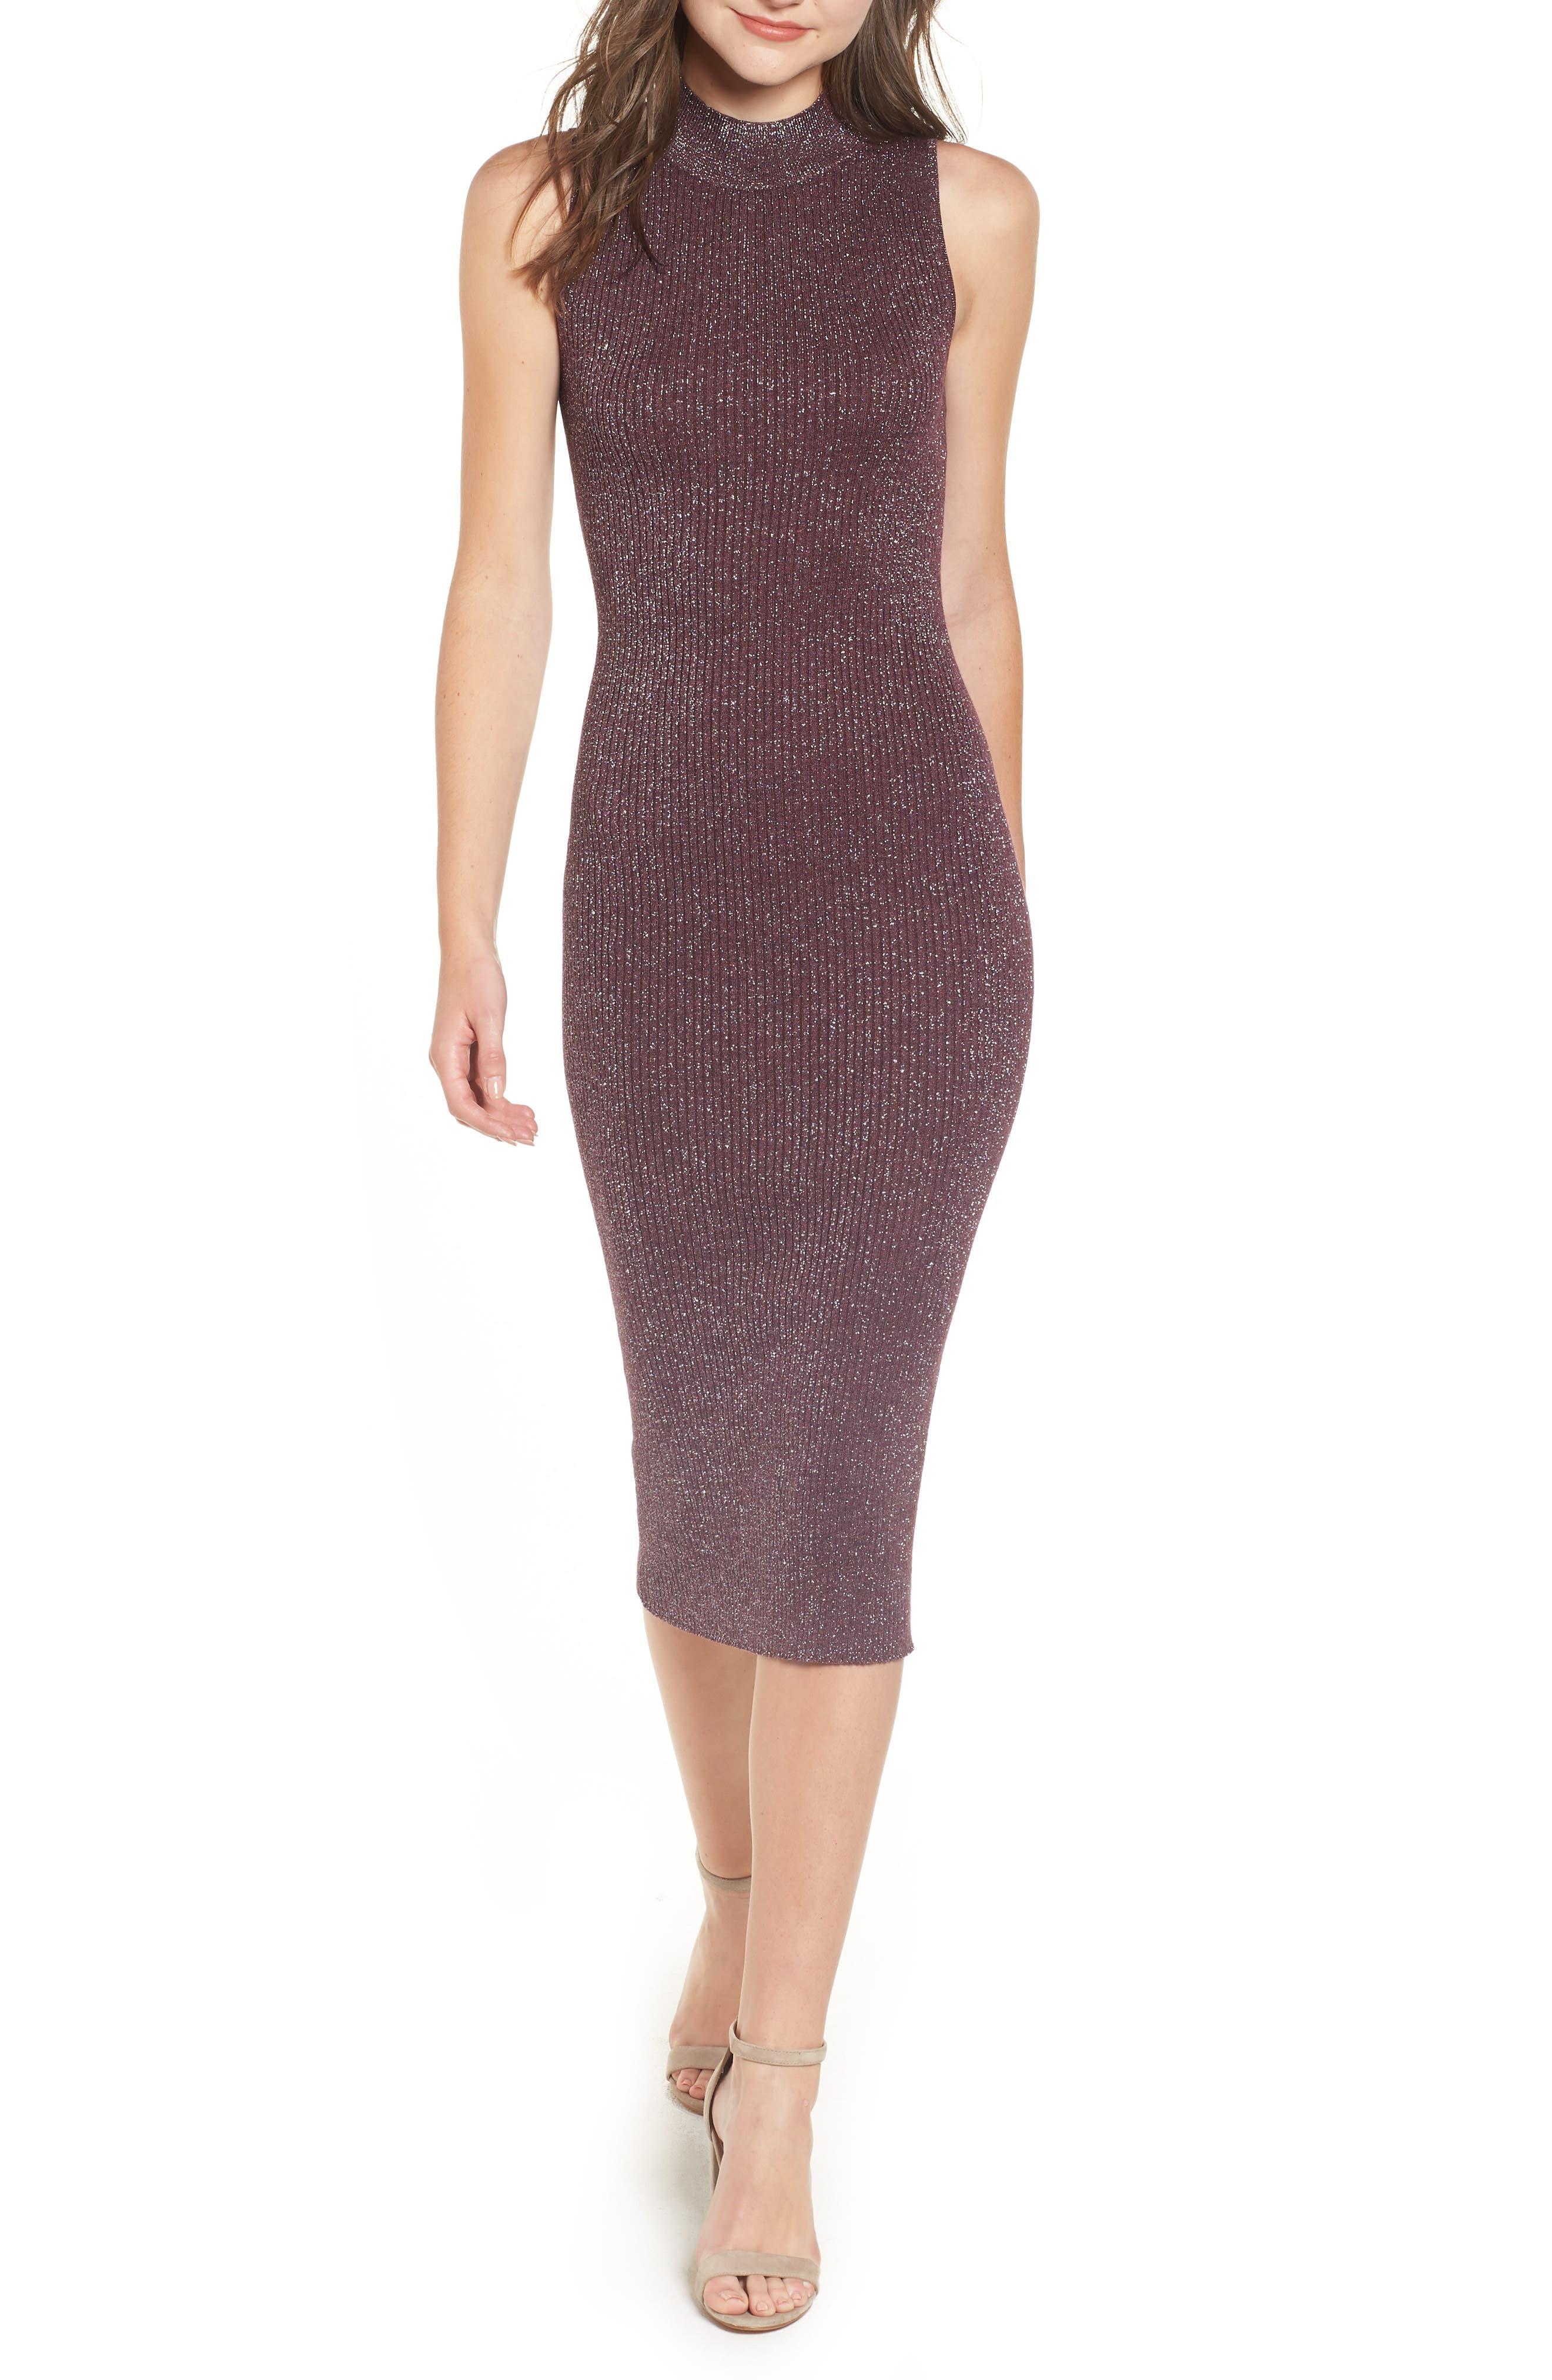 Chelsea28 Metallic Ribbed Body-Con Dress, Burgundy